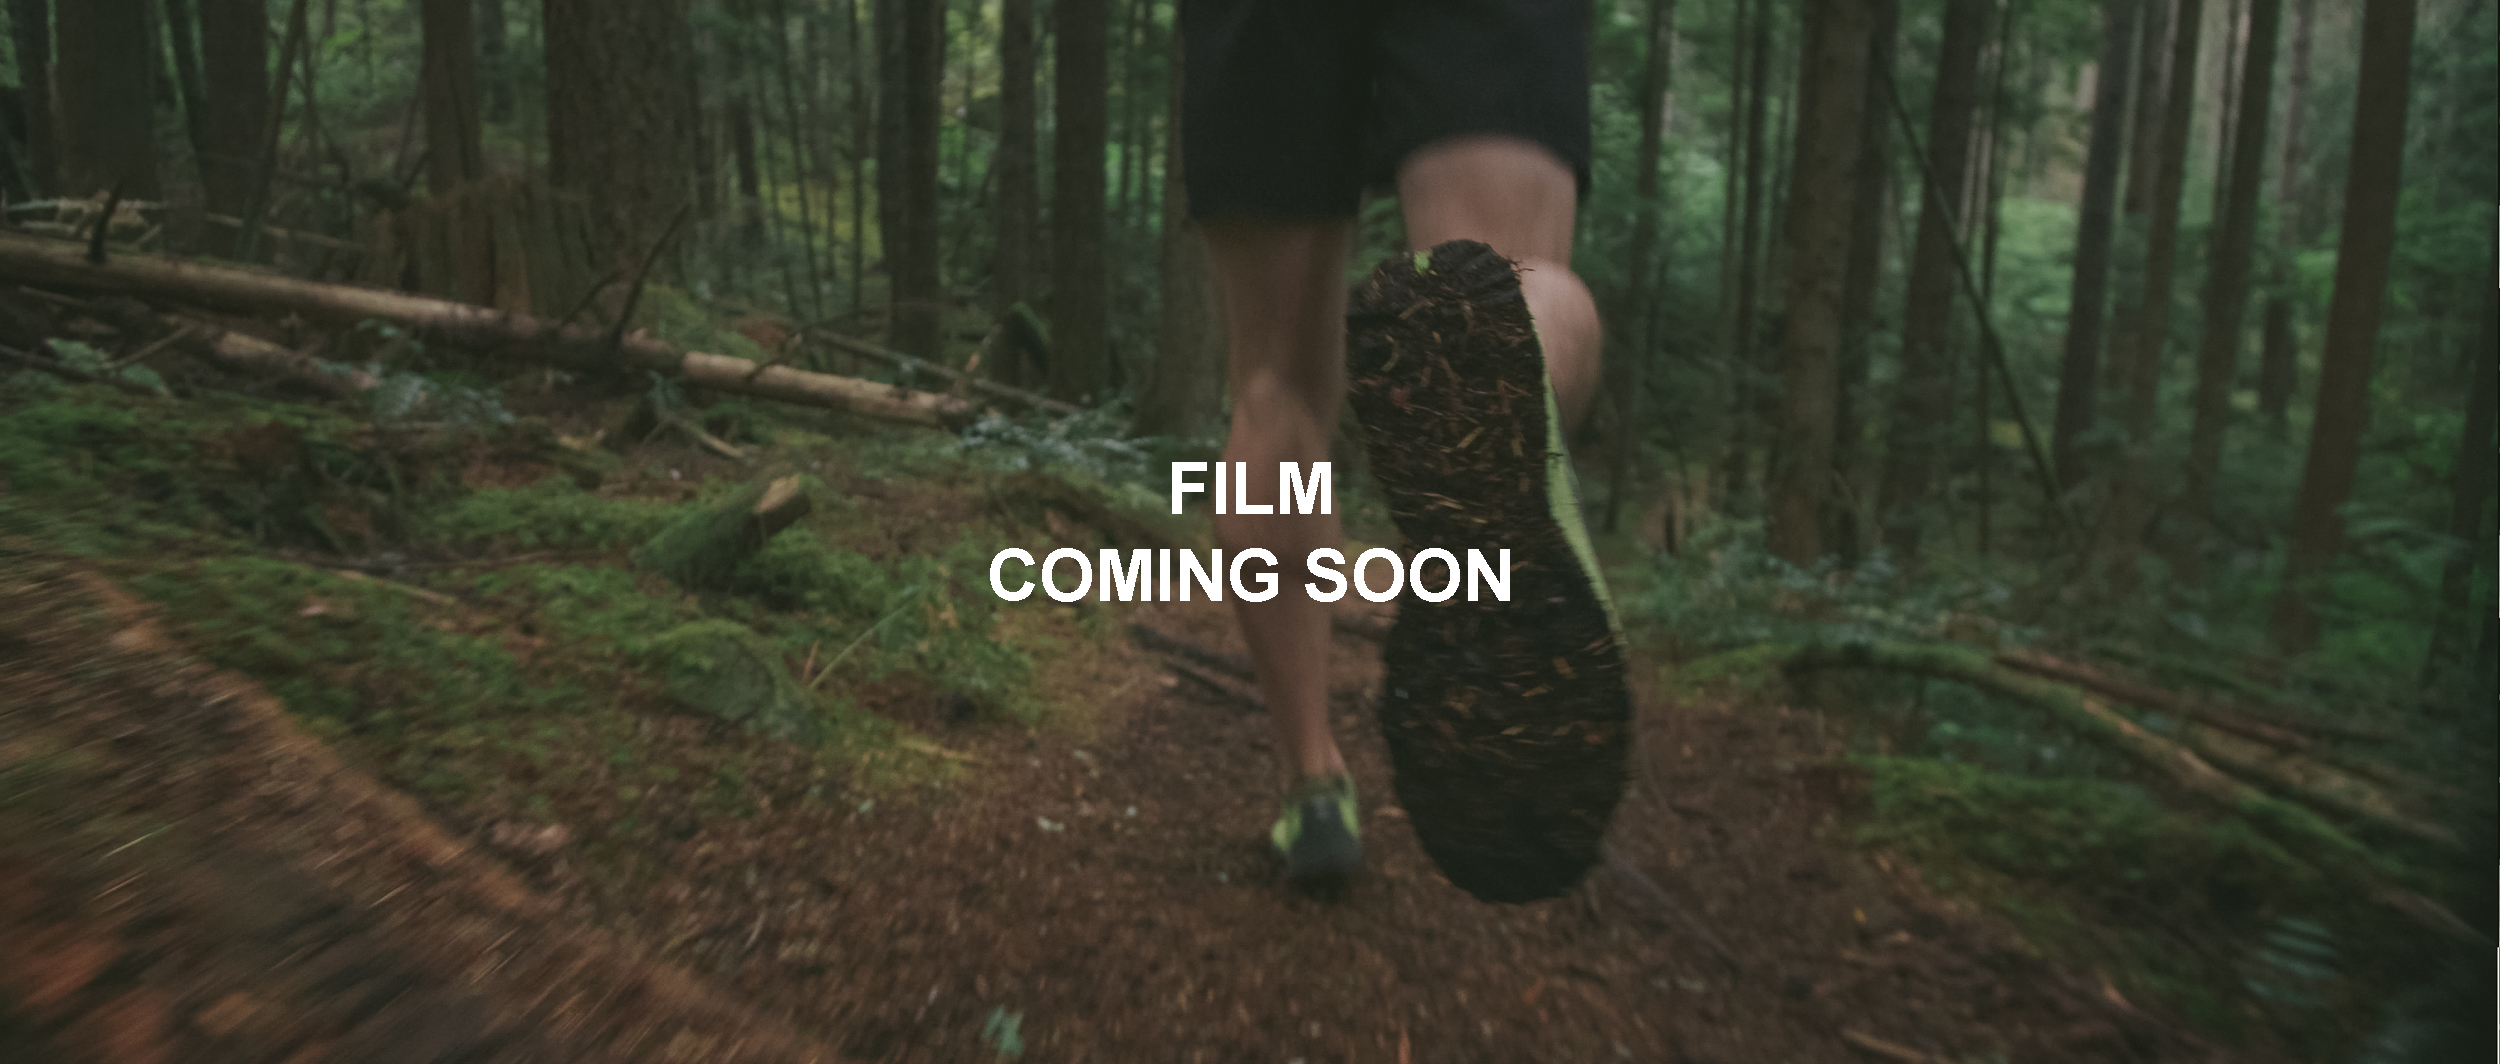 Running-Coming soon.jpg